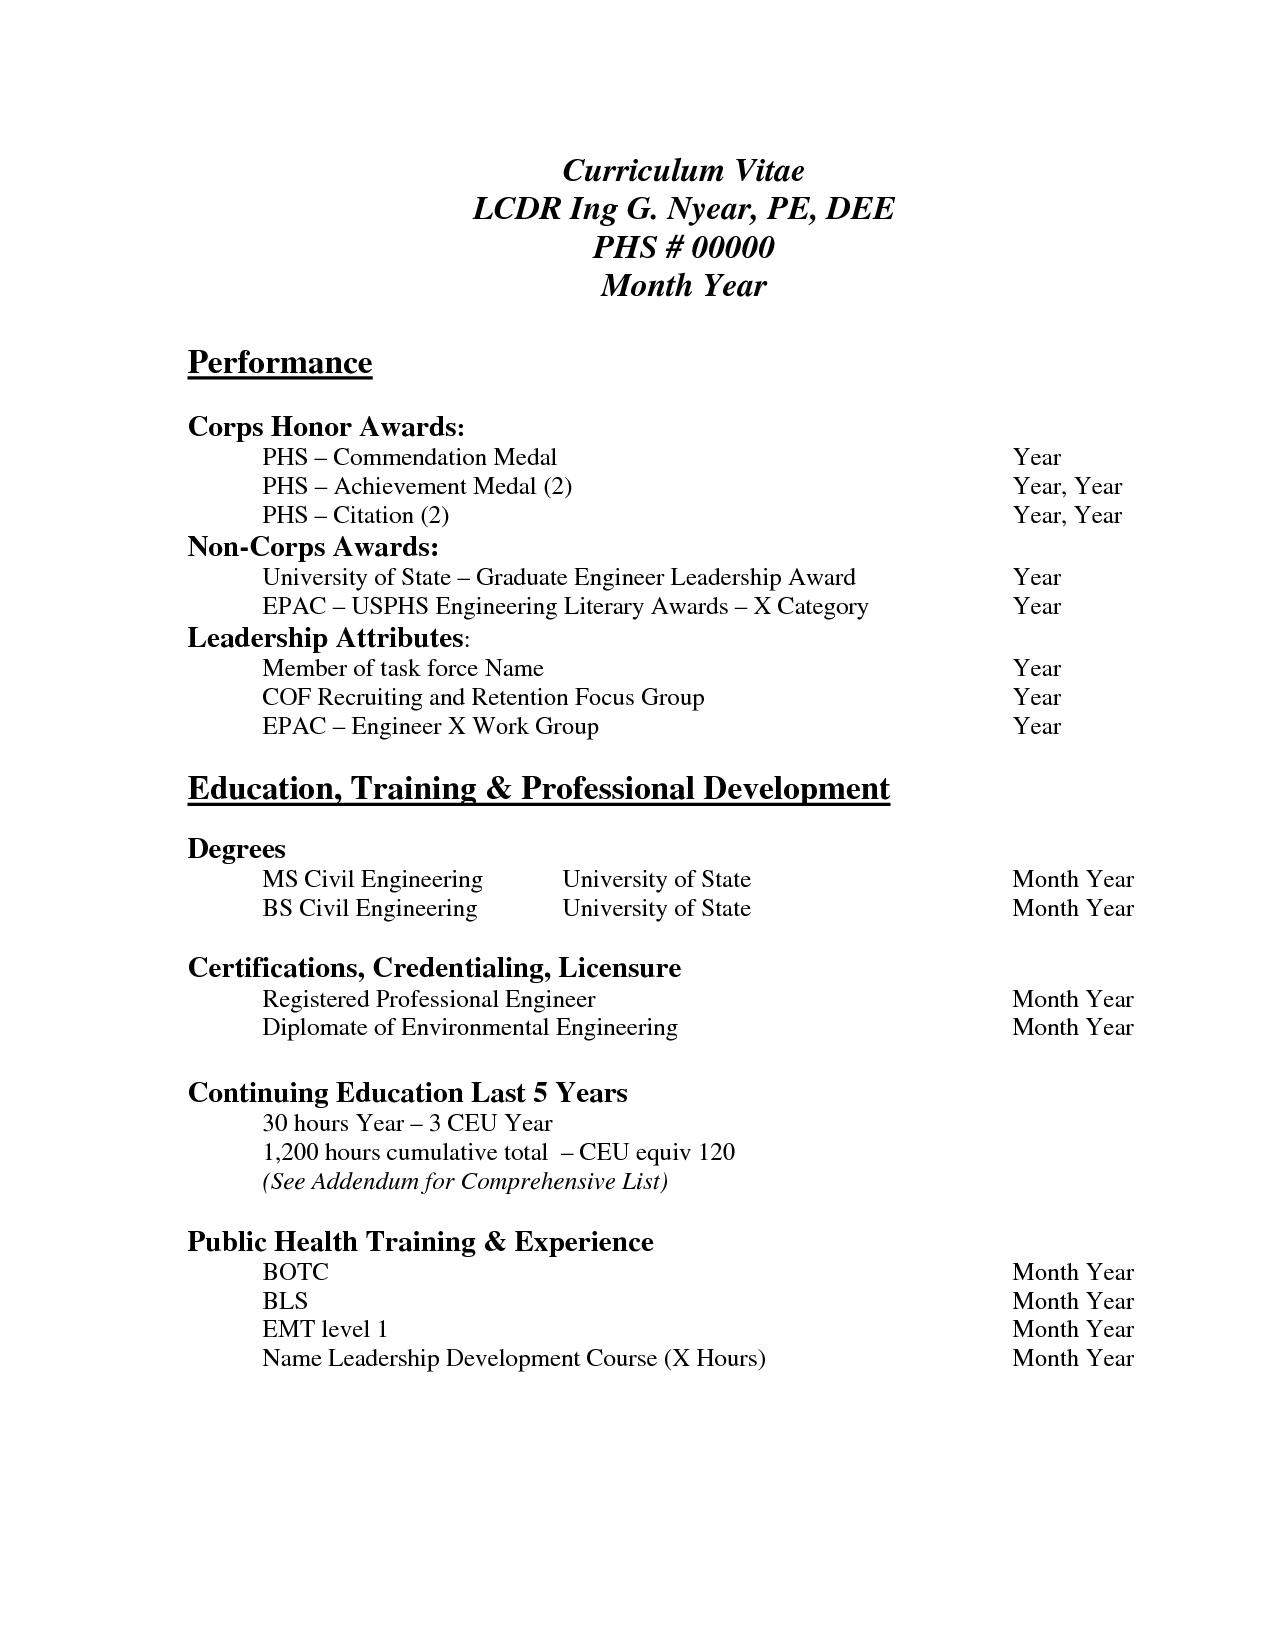 Basic Resume Template Pdf - Http://www.resumecareer.info/basic-Resume- Template-Pdf-11/